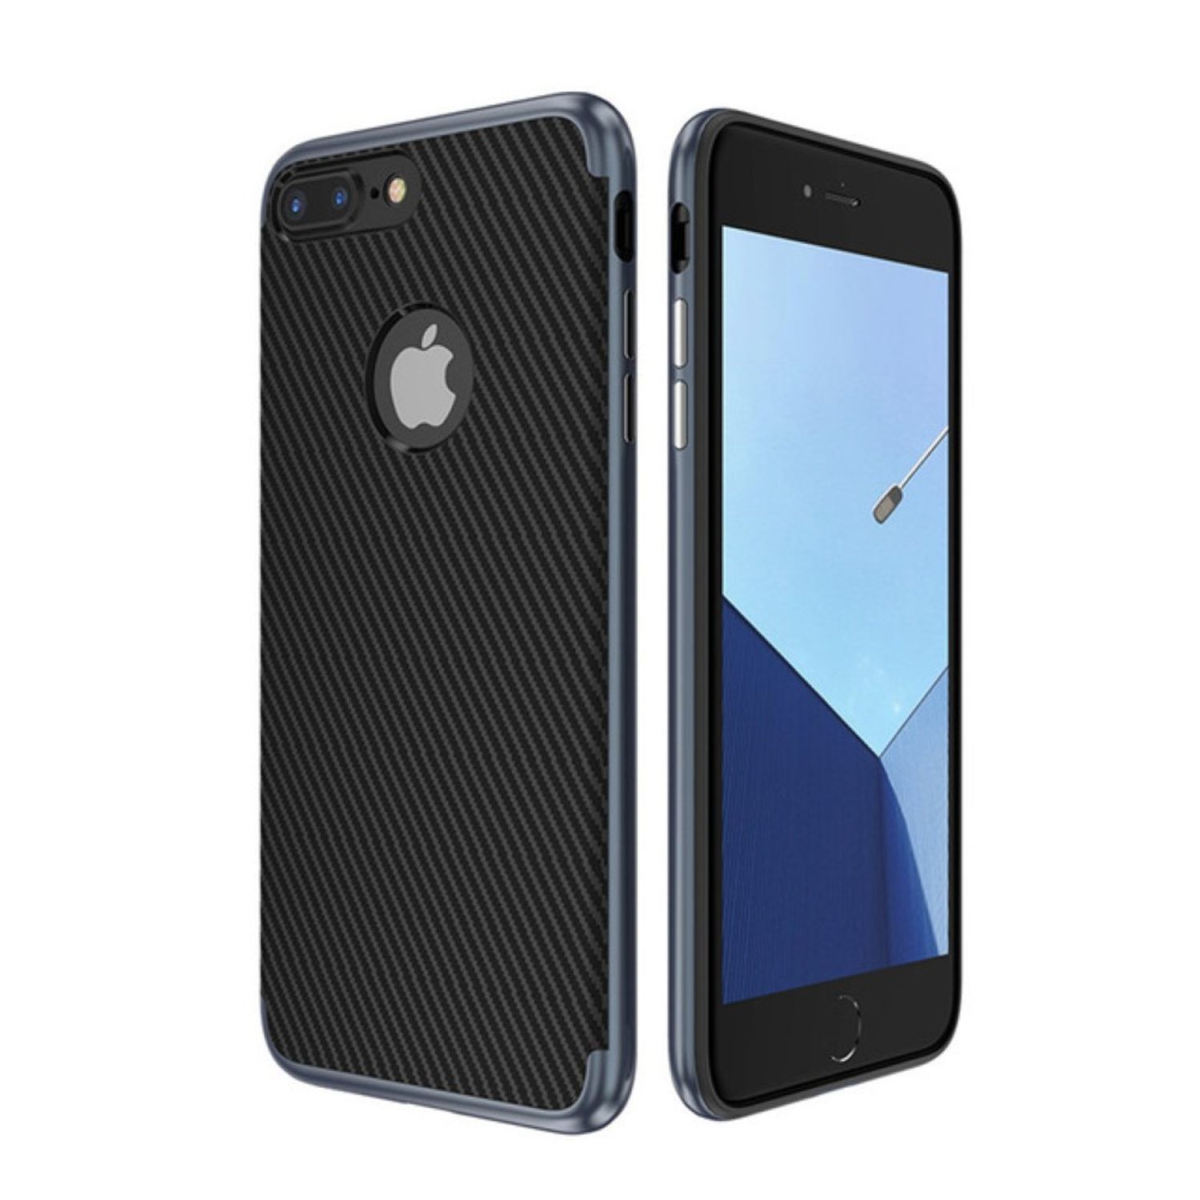 hybrid silikon handy h lle f r apple iphone 7 plus case cover tasche blau. Black Bedroom Furniture Sets. Home Design Ideas